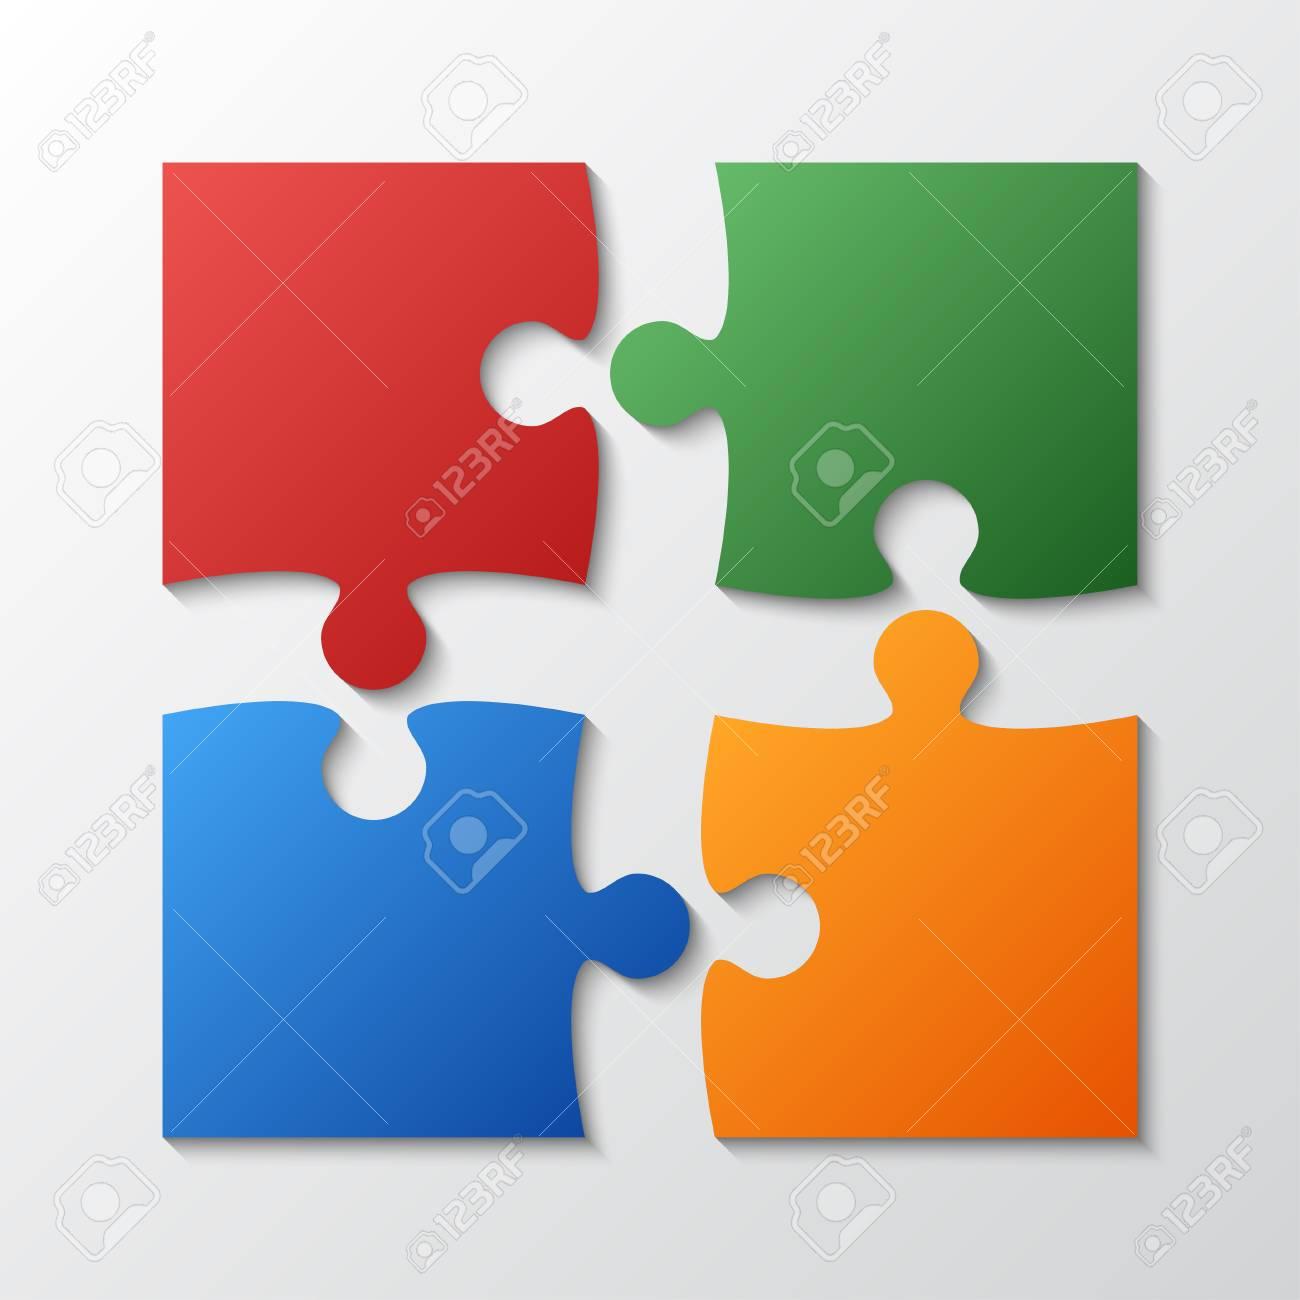 A four color piece jigsaw puzzle round infographic presentation. - 87442402